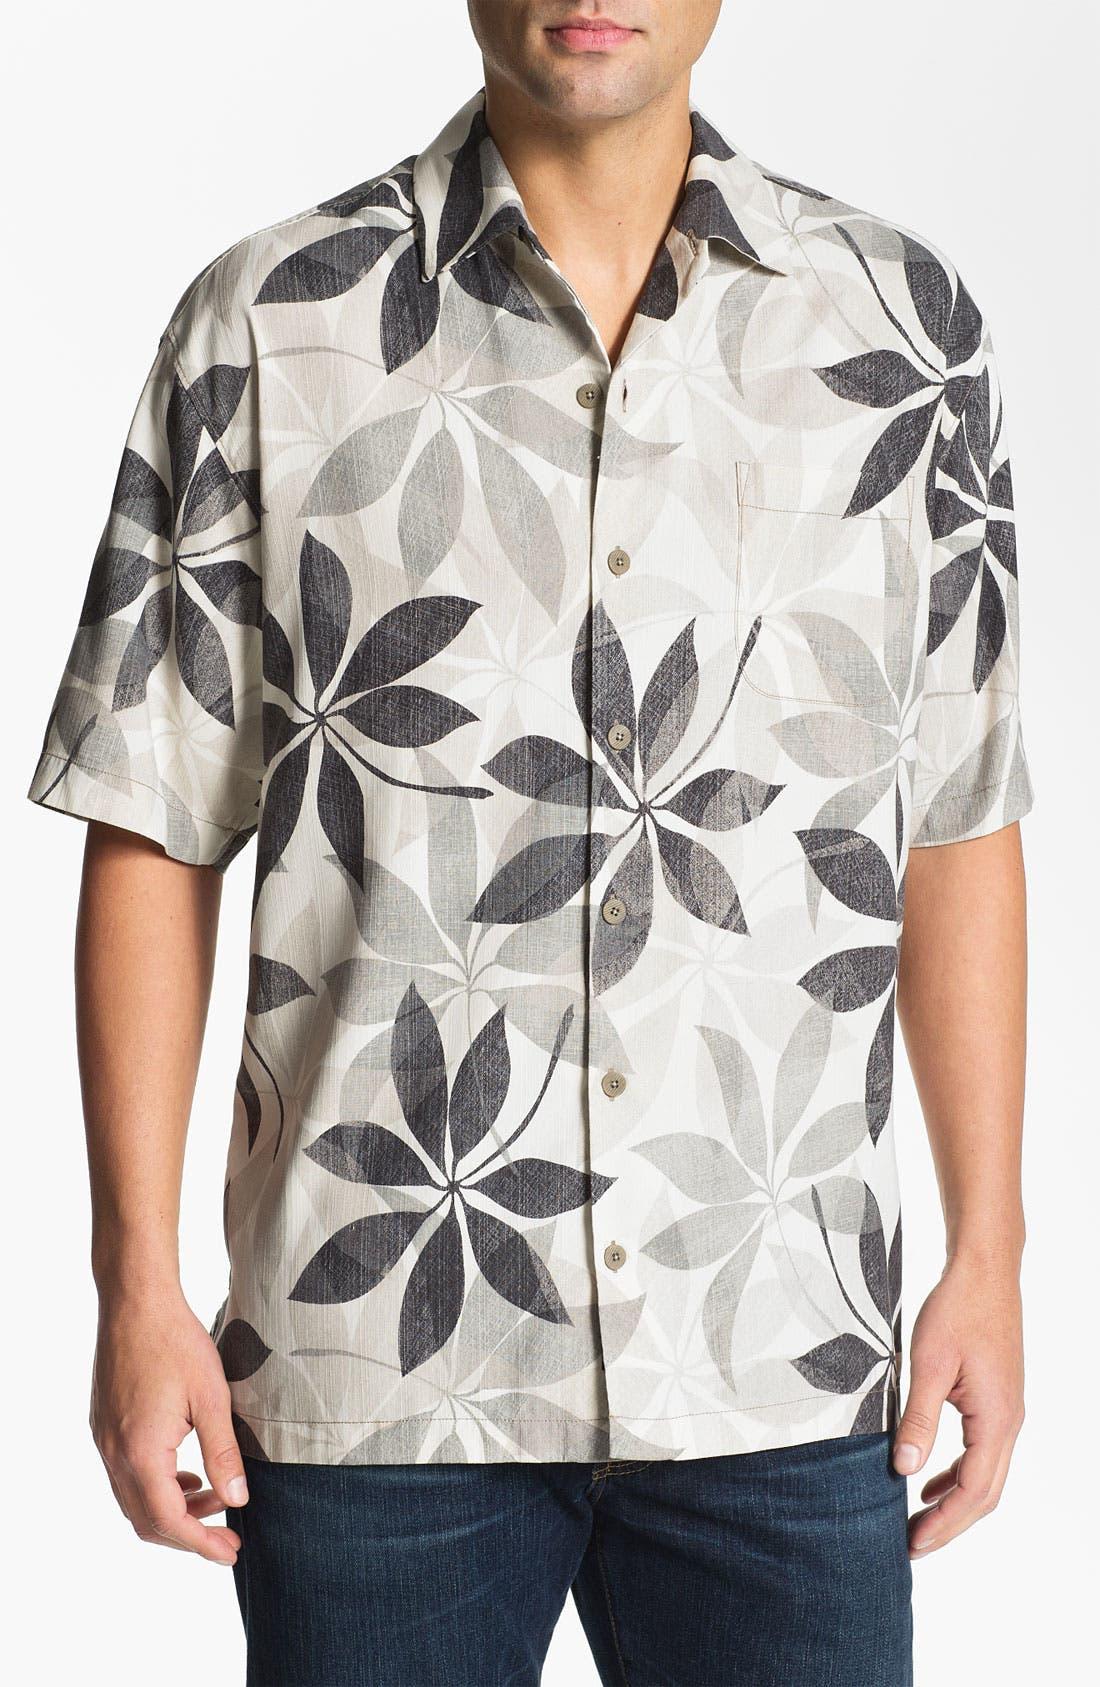 Alternate Image 1 Selected - Tommy Bahama 'Petal Paradise' Silk Campshirt